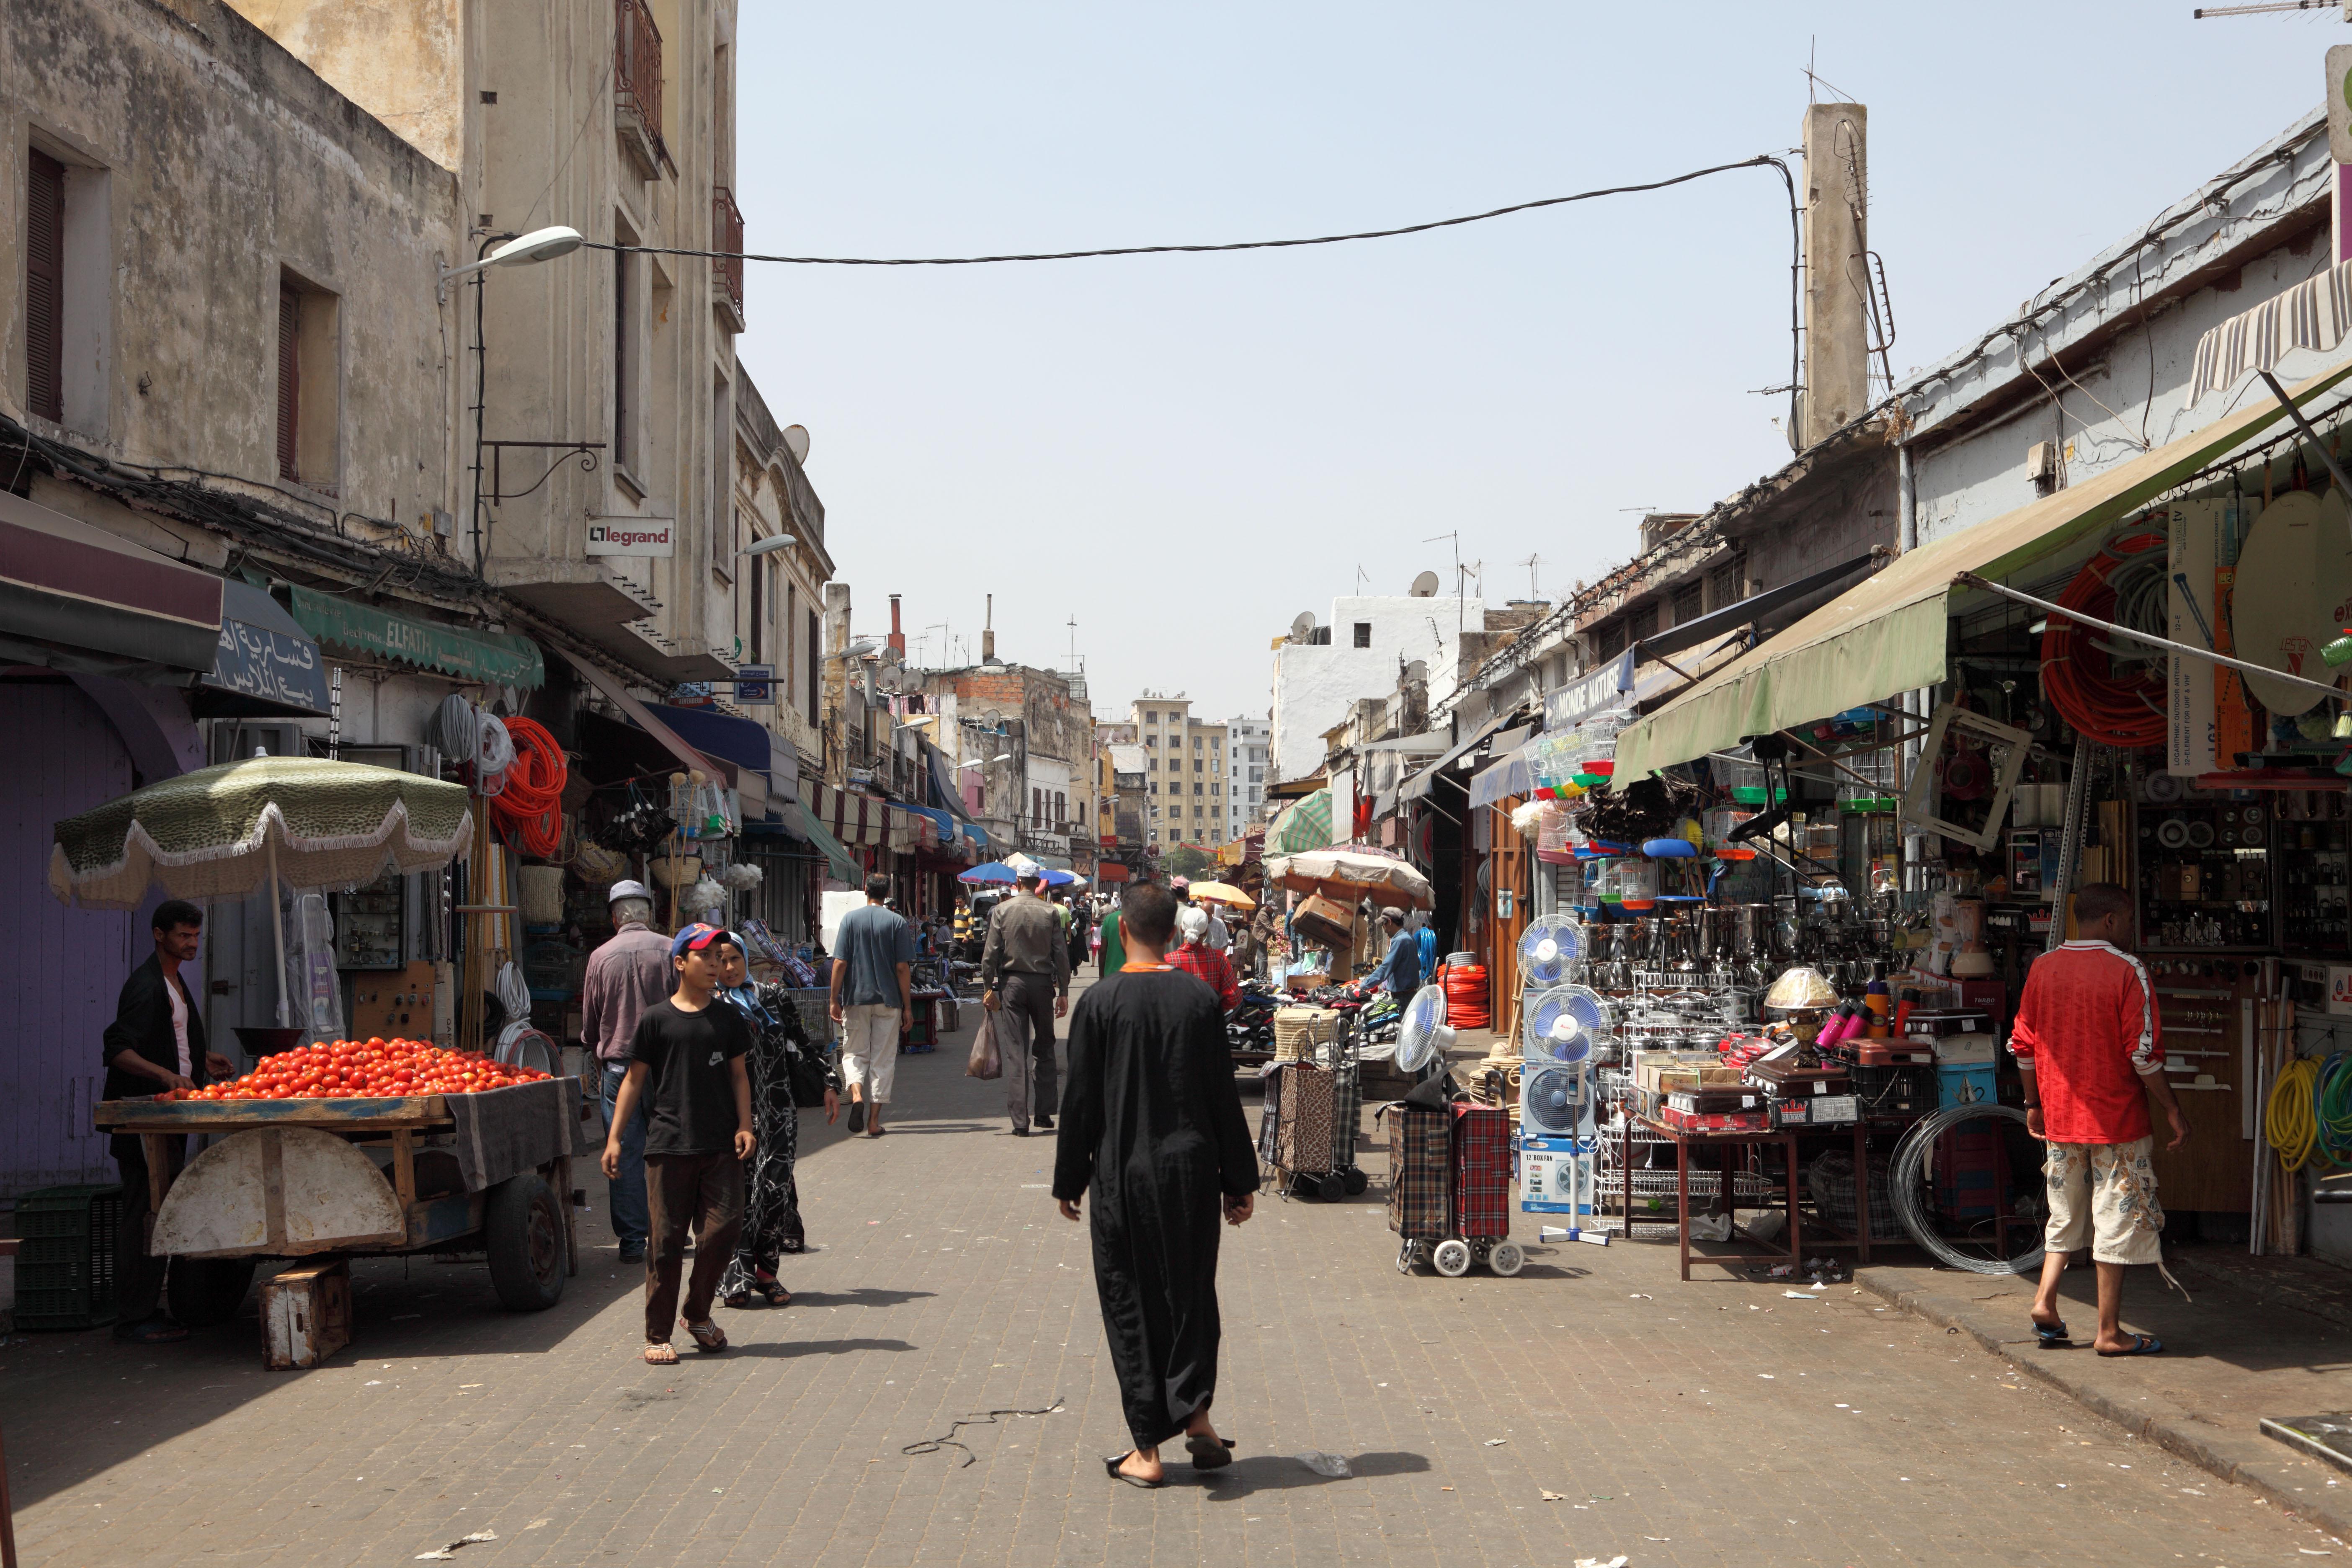 Street in the medina of Casablanca, Morocco